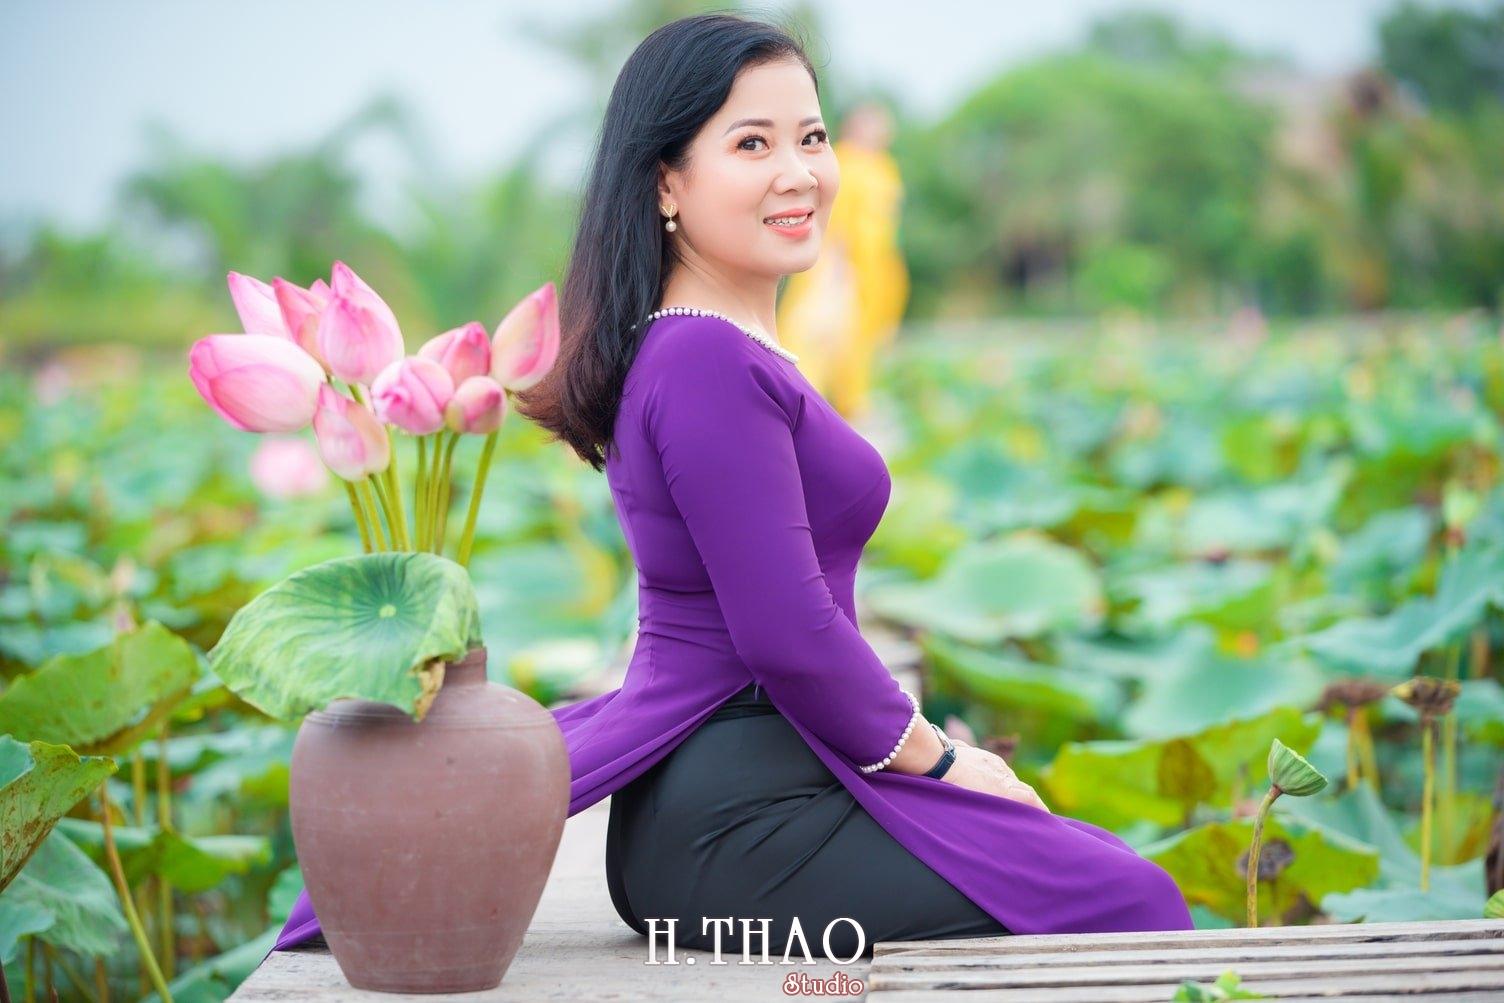 Chụp ảnh hoa sen